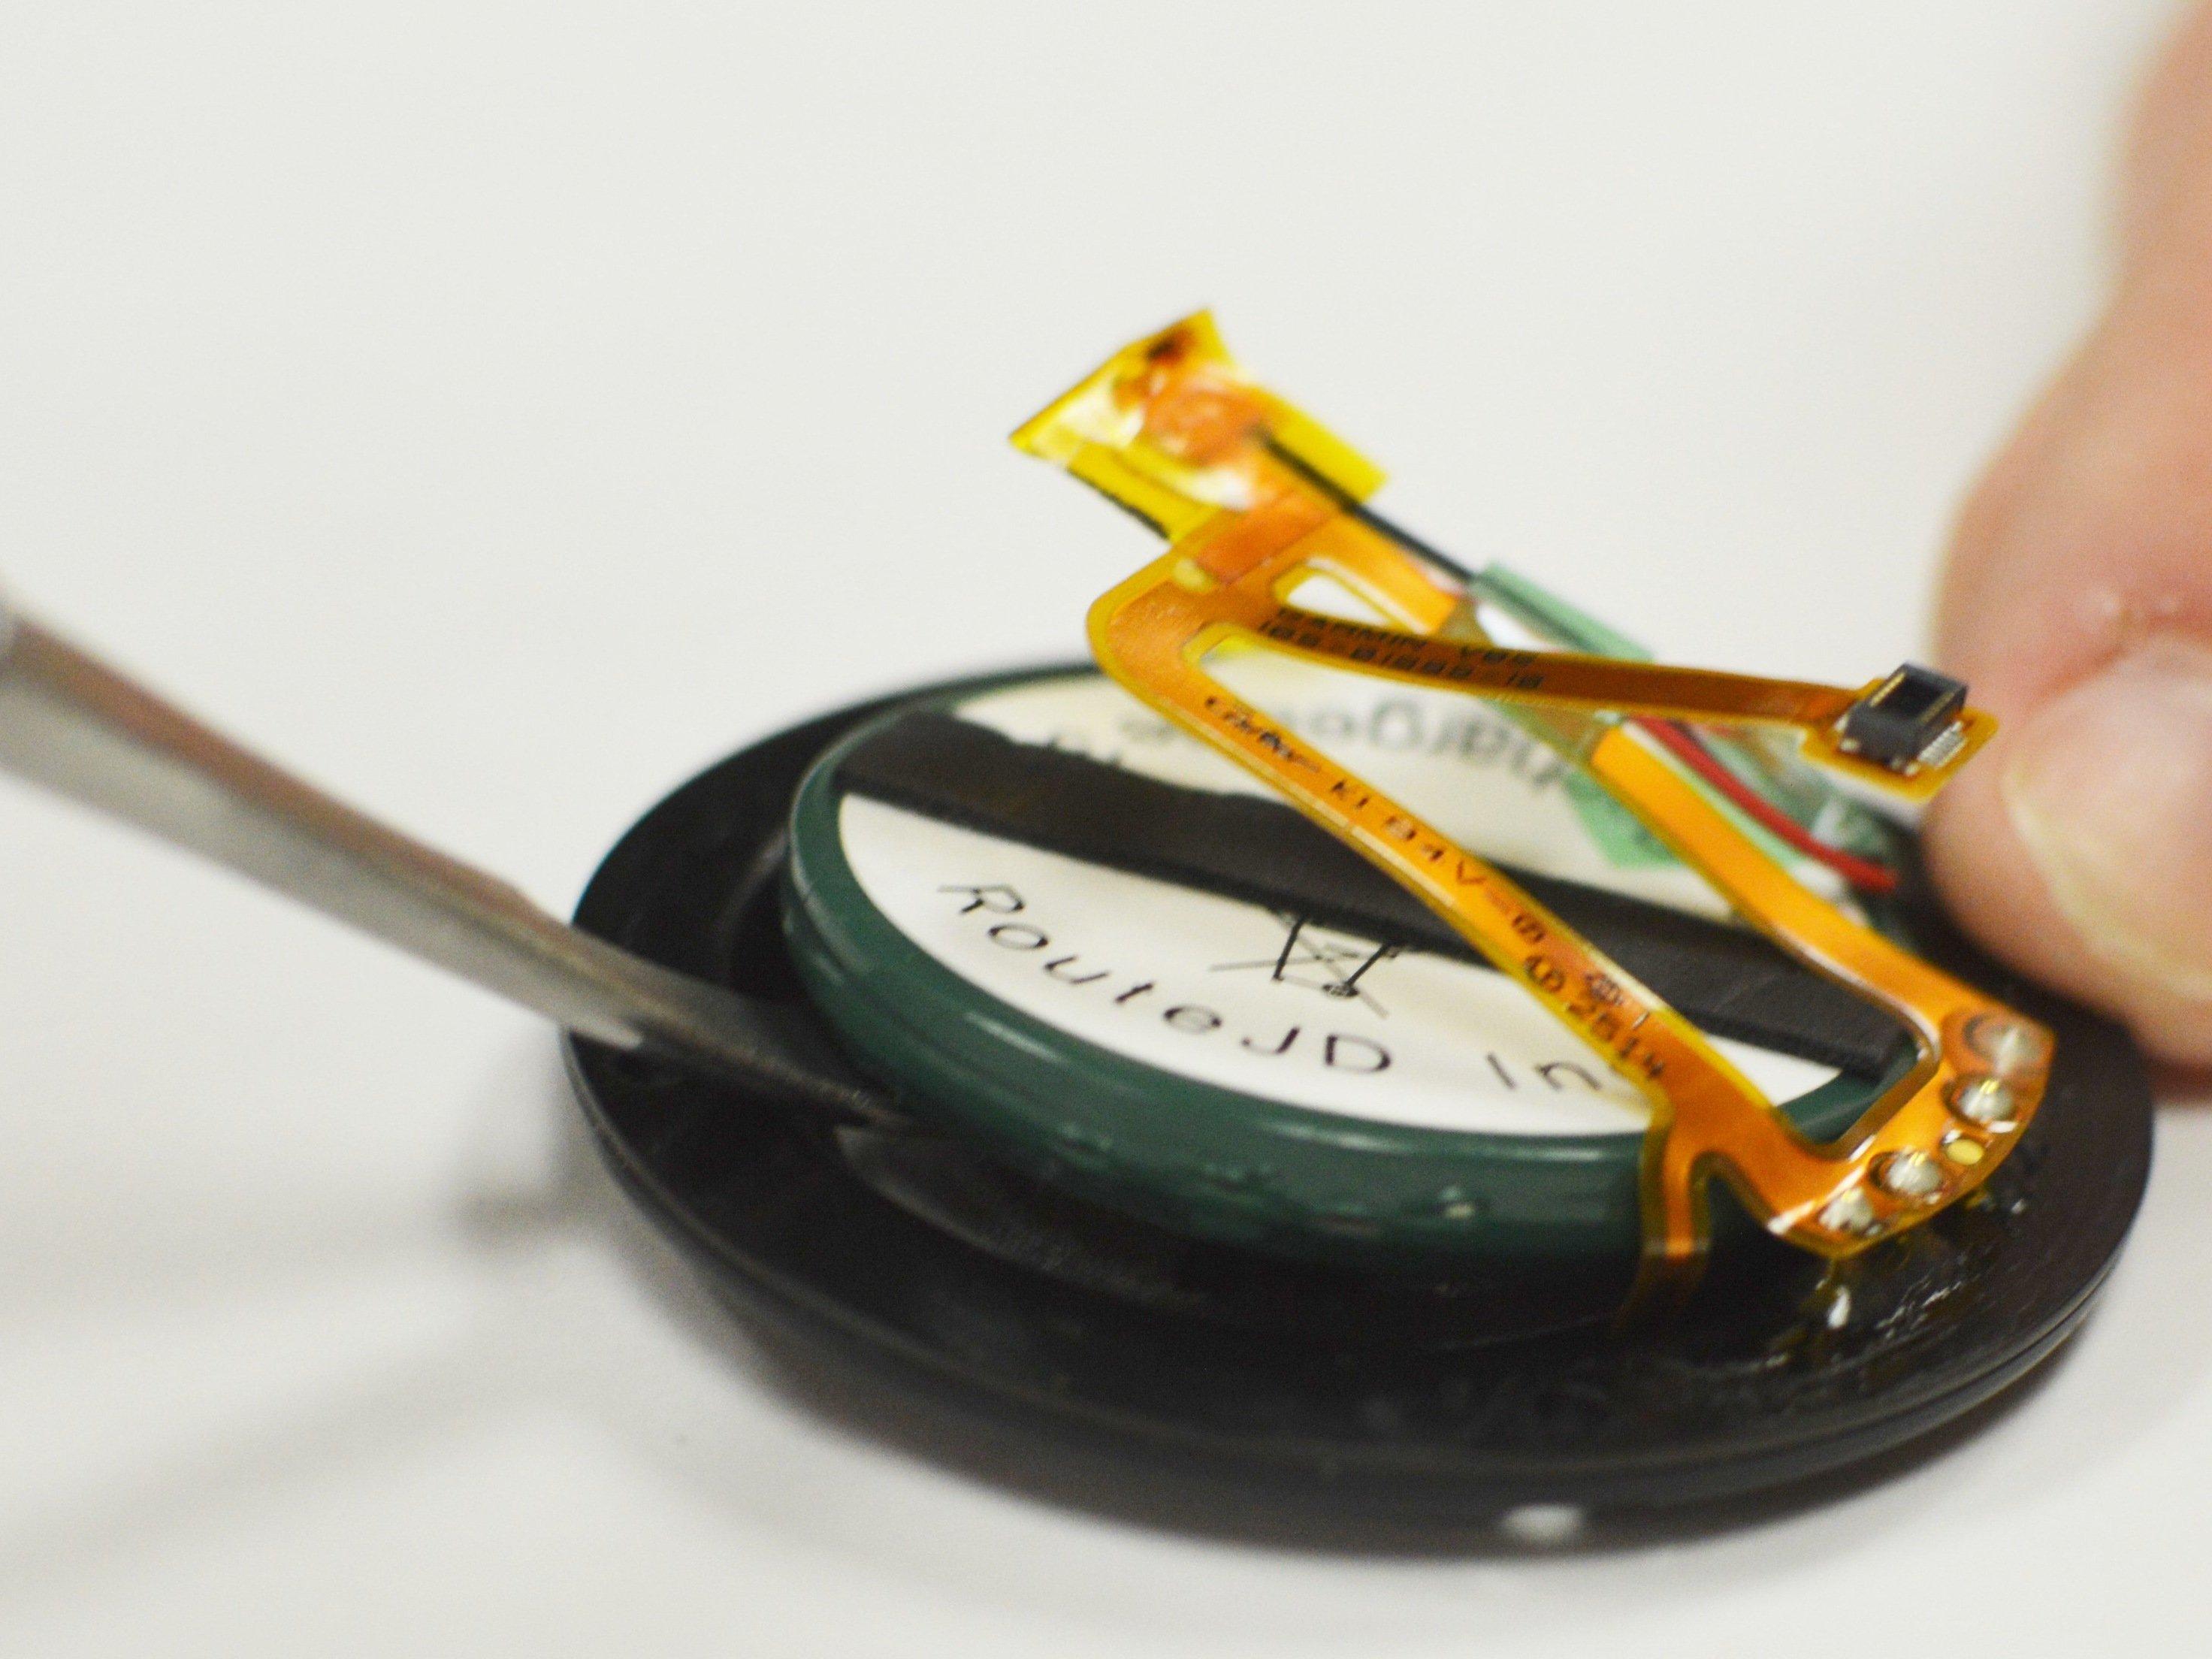 Garmin Fenix 2 Battery Replacement - iFixit Repair Guide